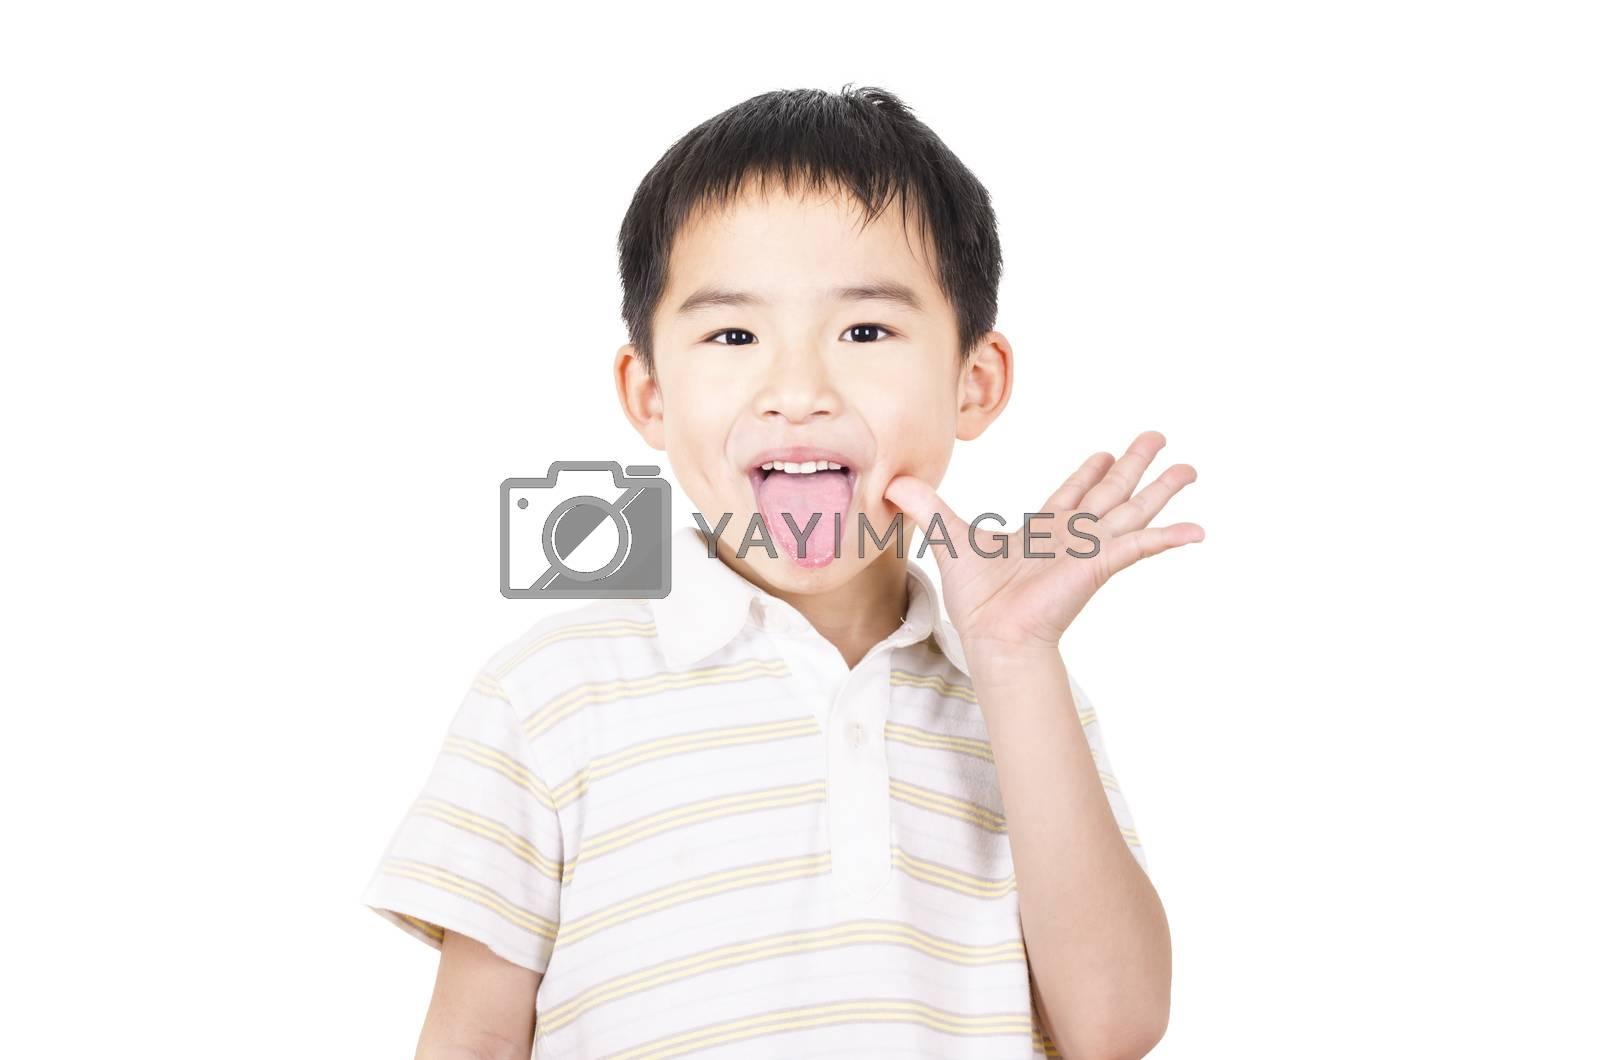 Royalty free image of Cute boy grimace by FrankyLiu